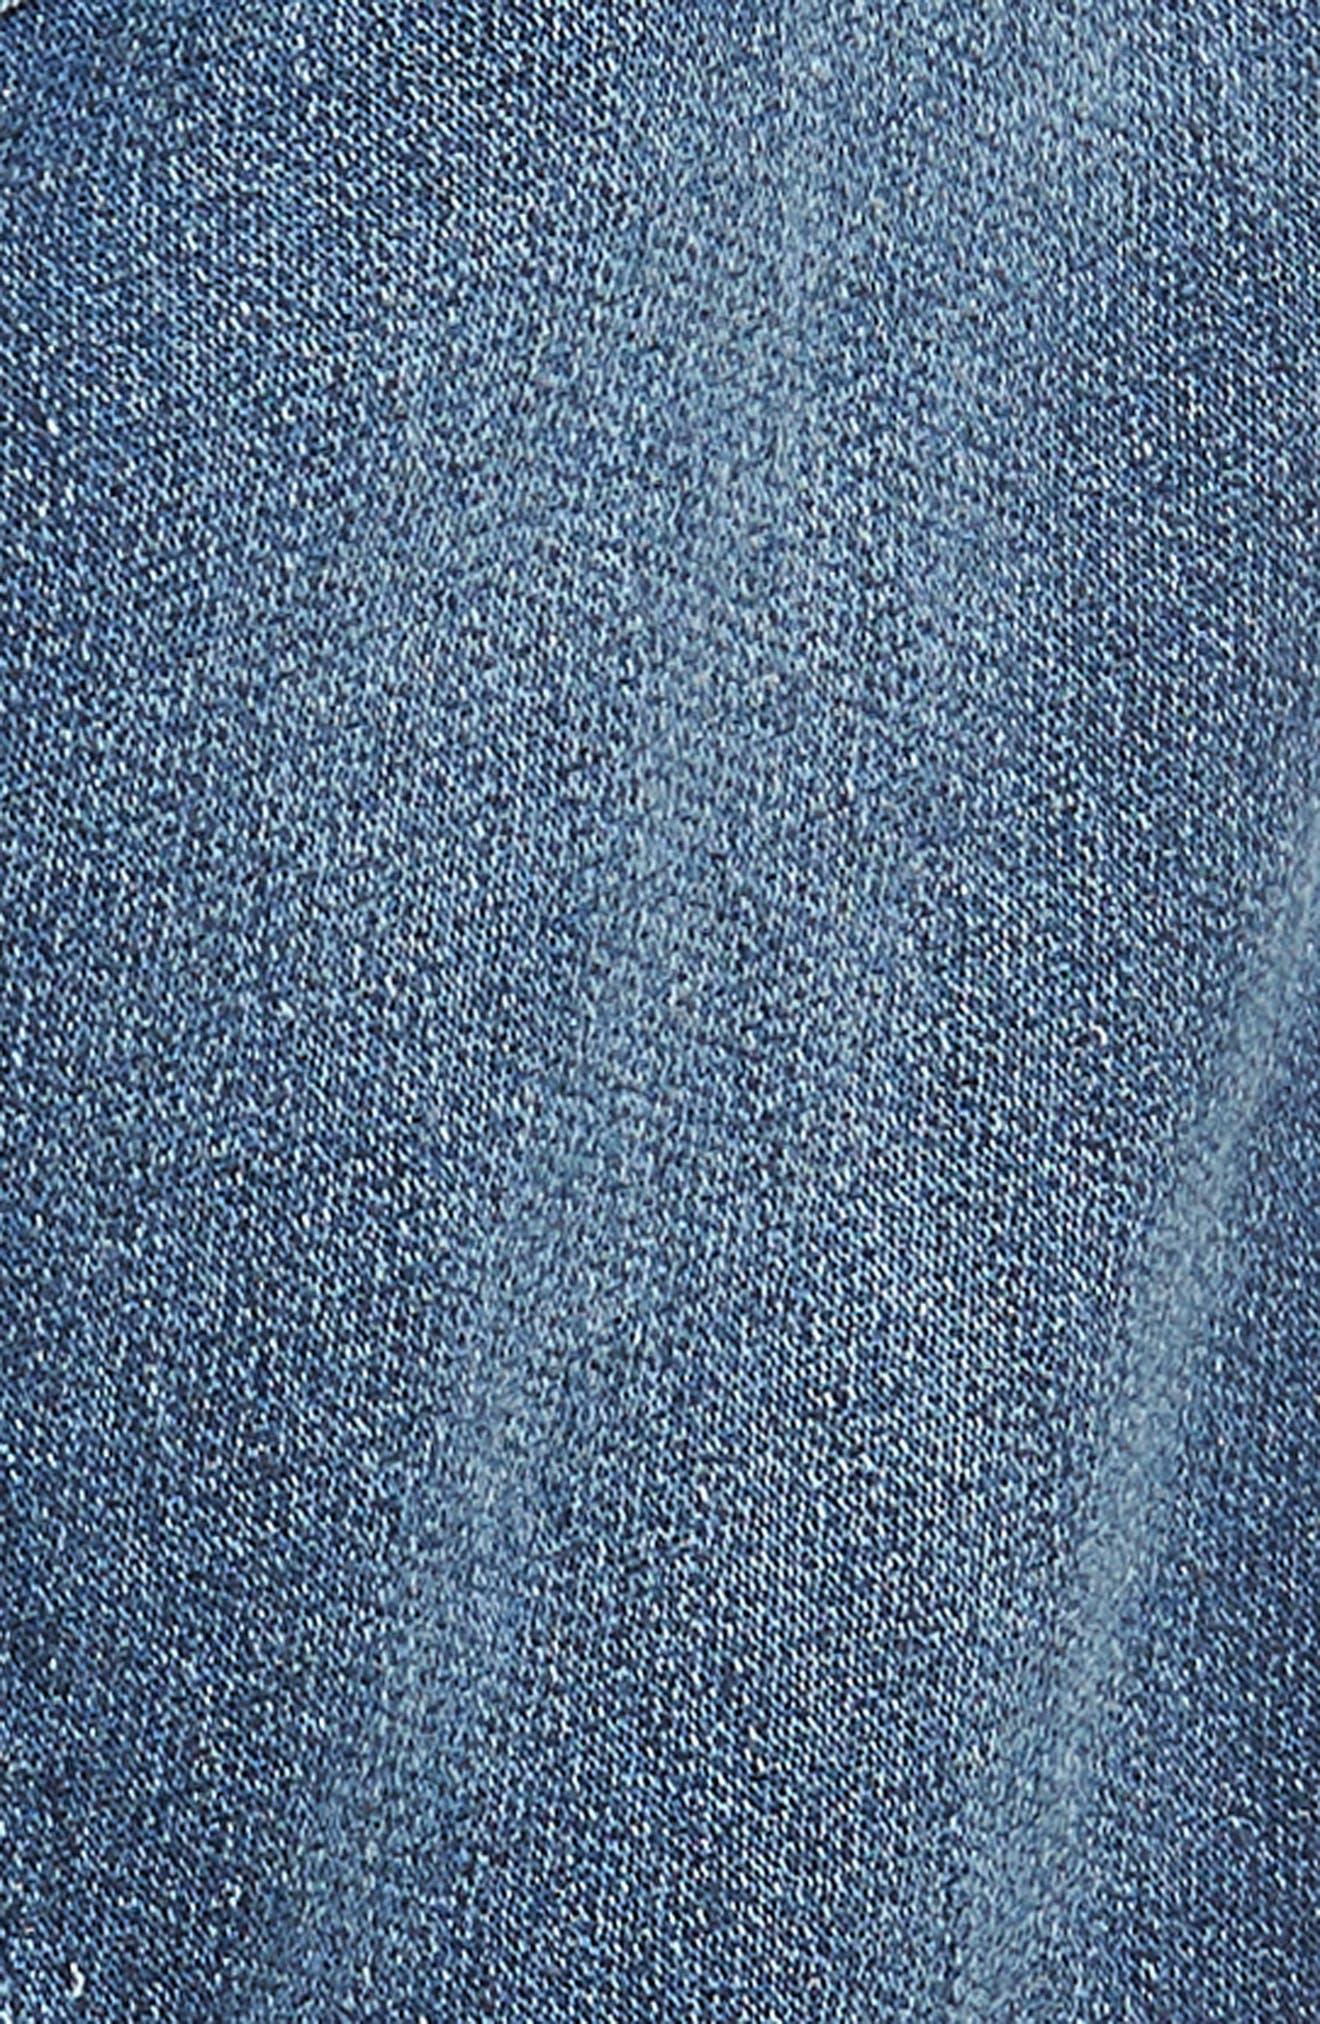 Krooshort Denim Shorts,                             Alternate thumbnail 5, color,                             0687C